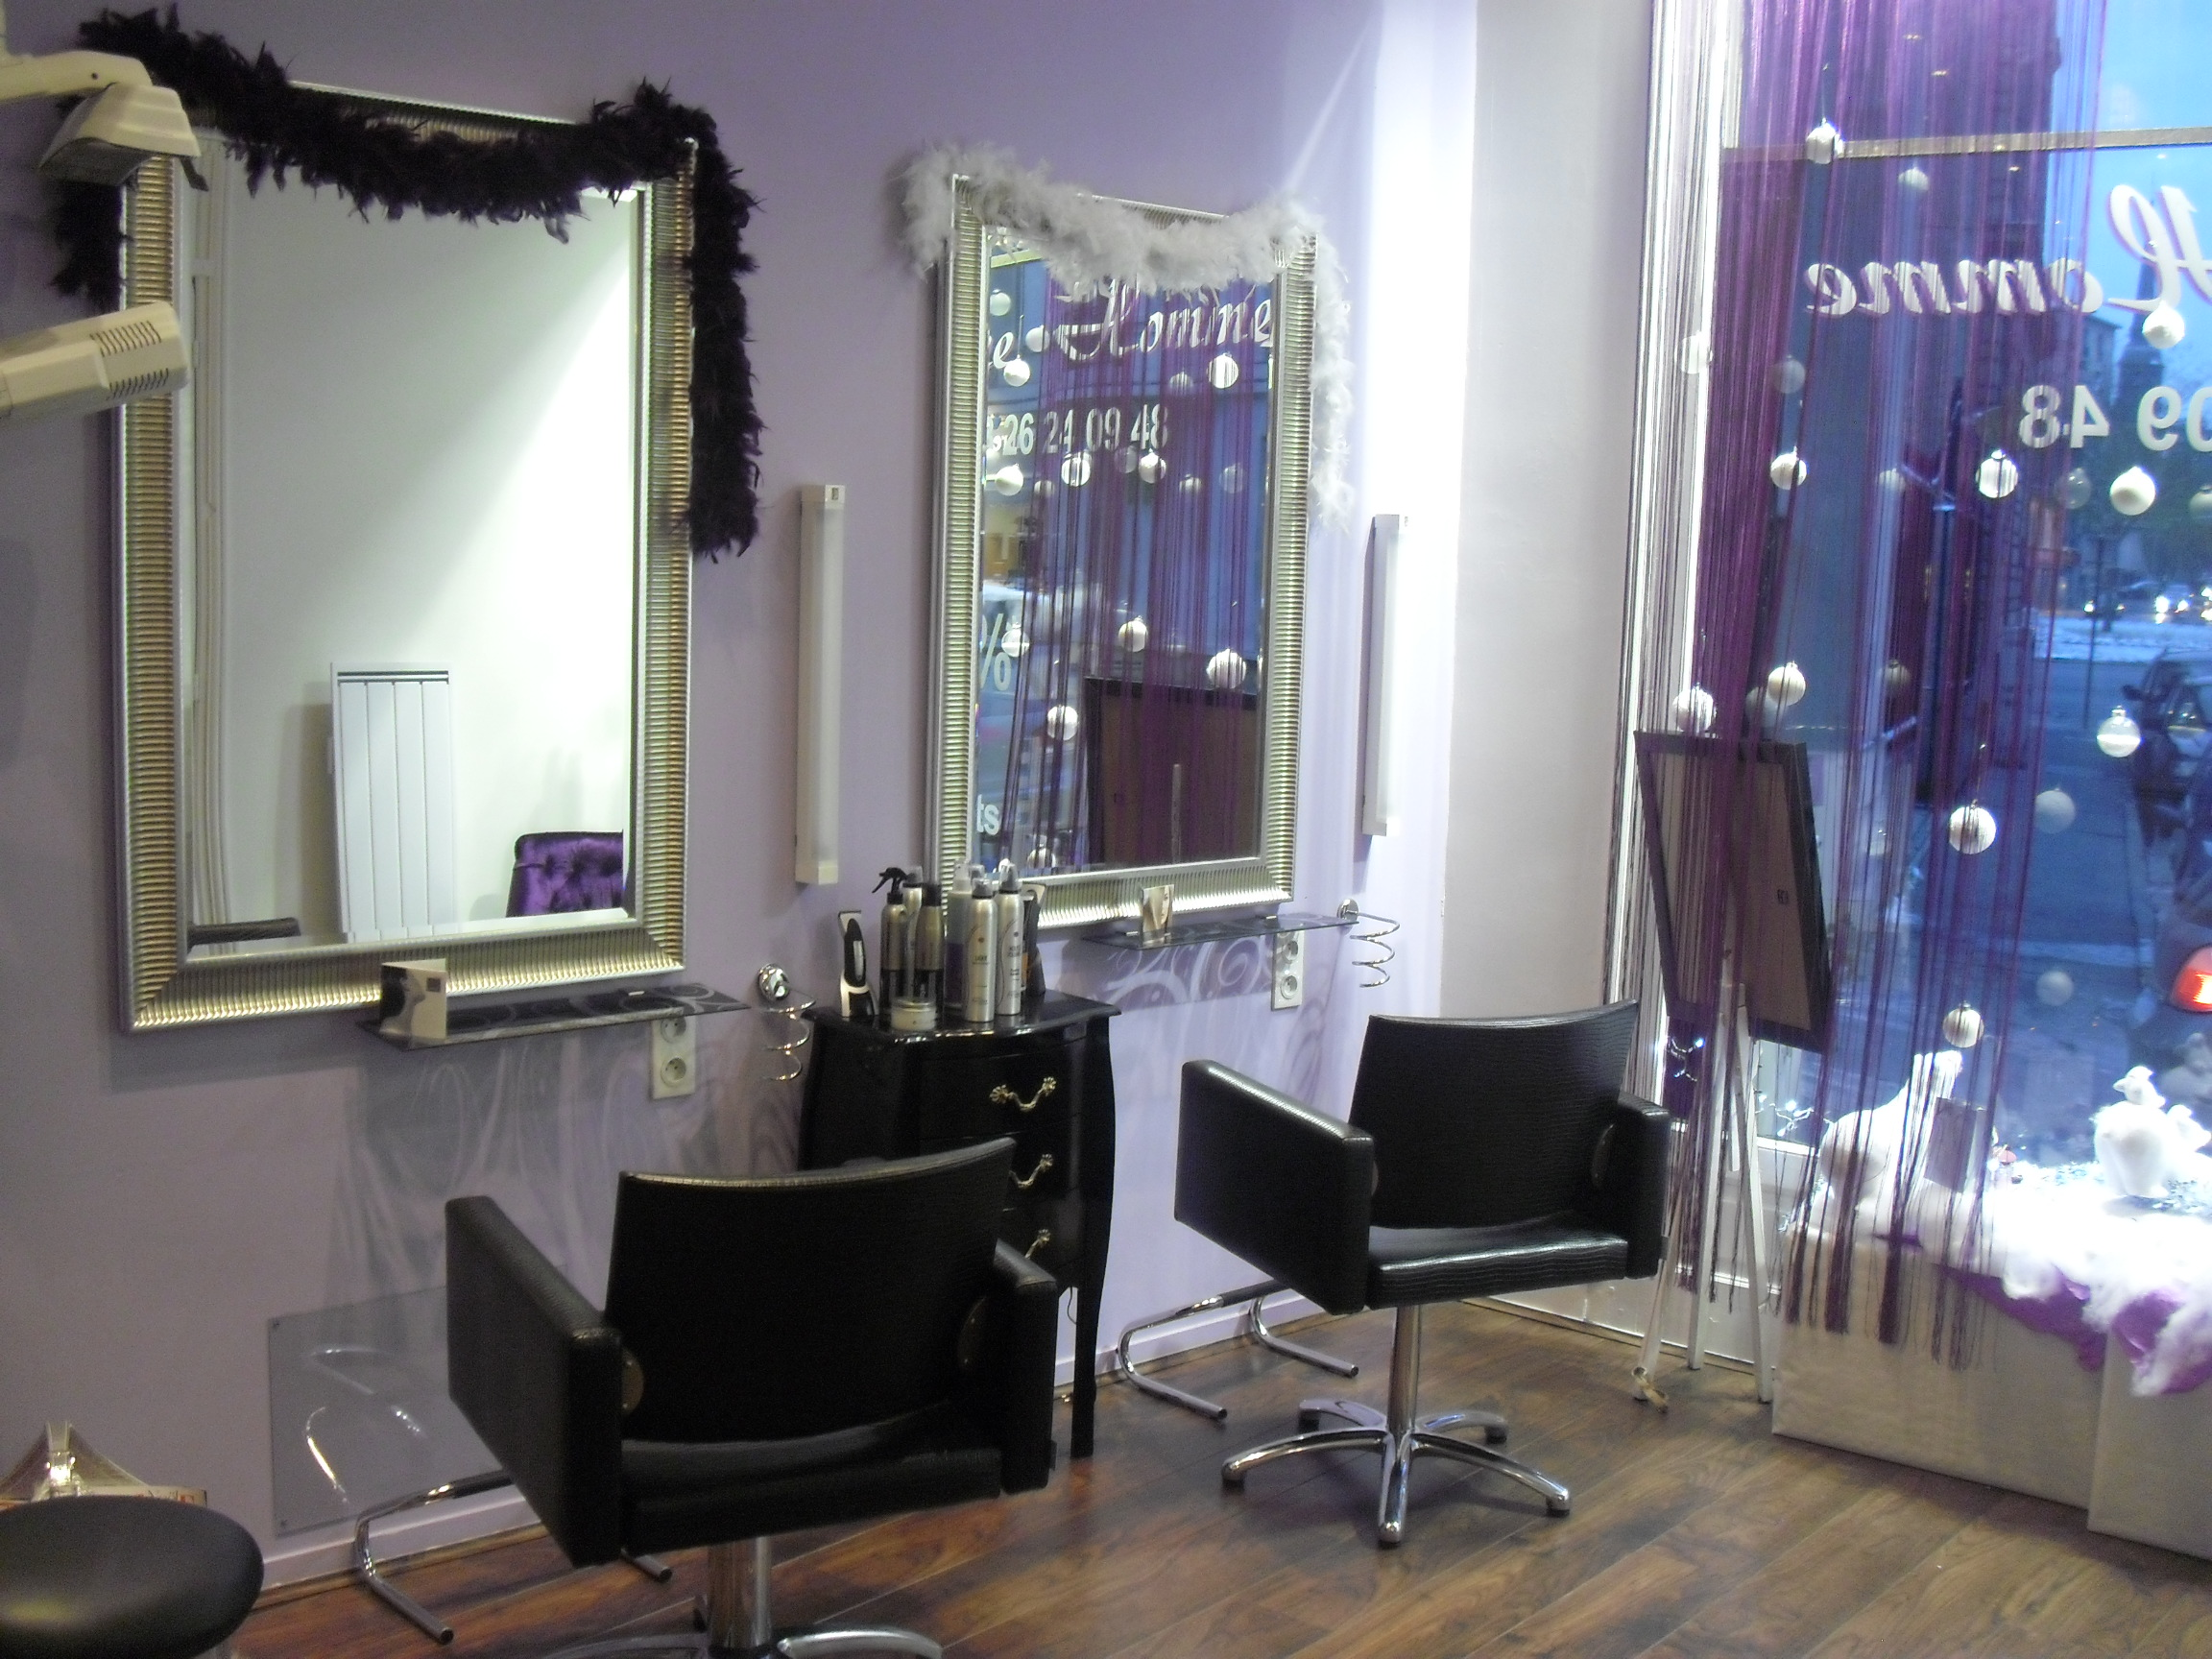 Picky hair reims avis tarifs horaires t l phone for Salon o coiffure reims